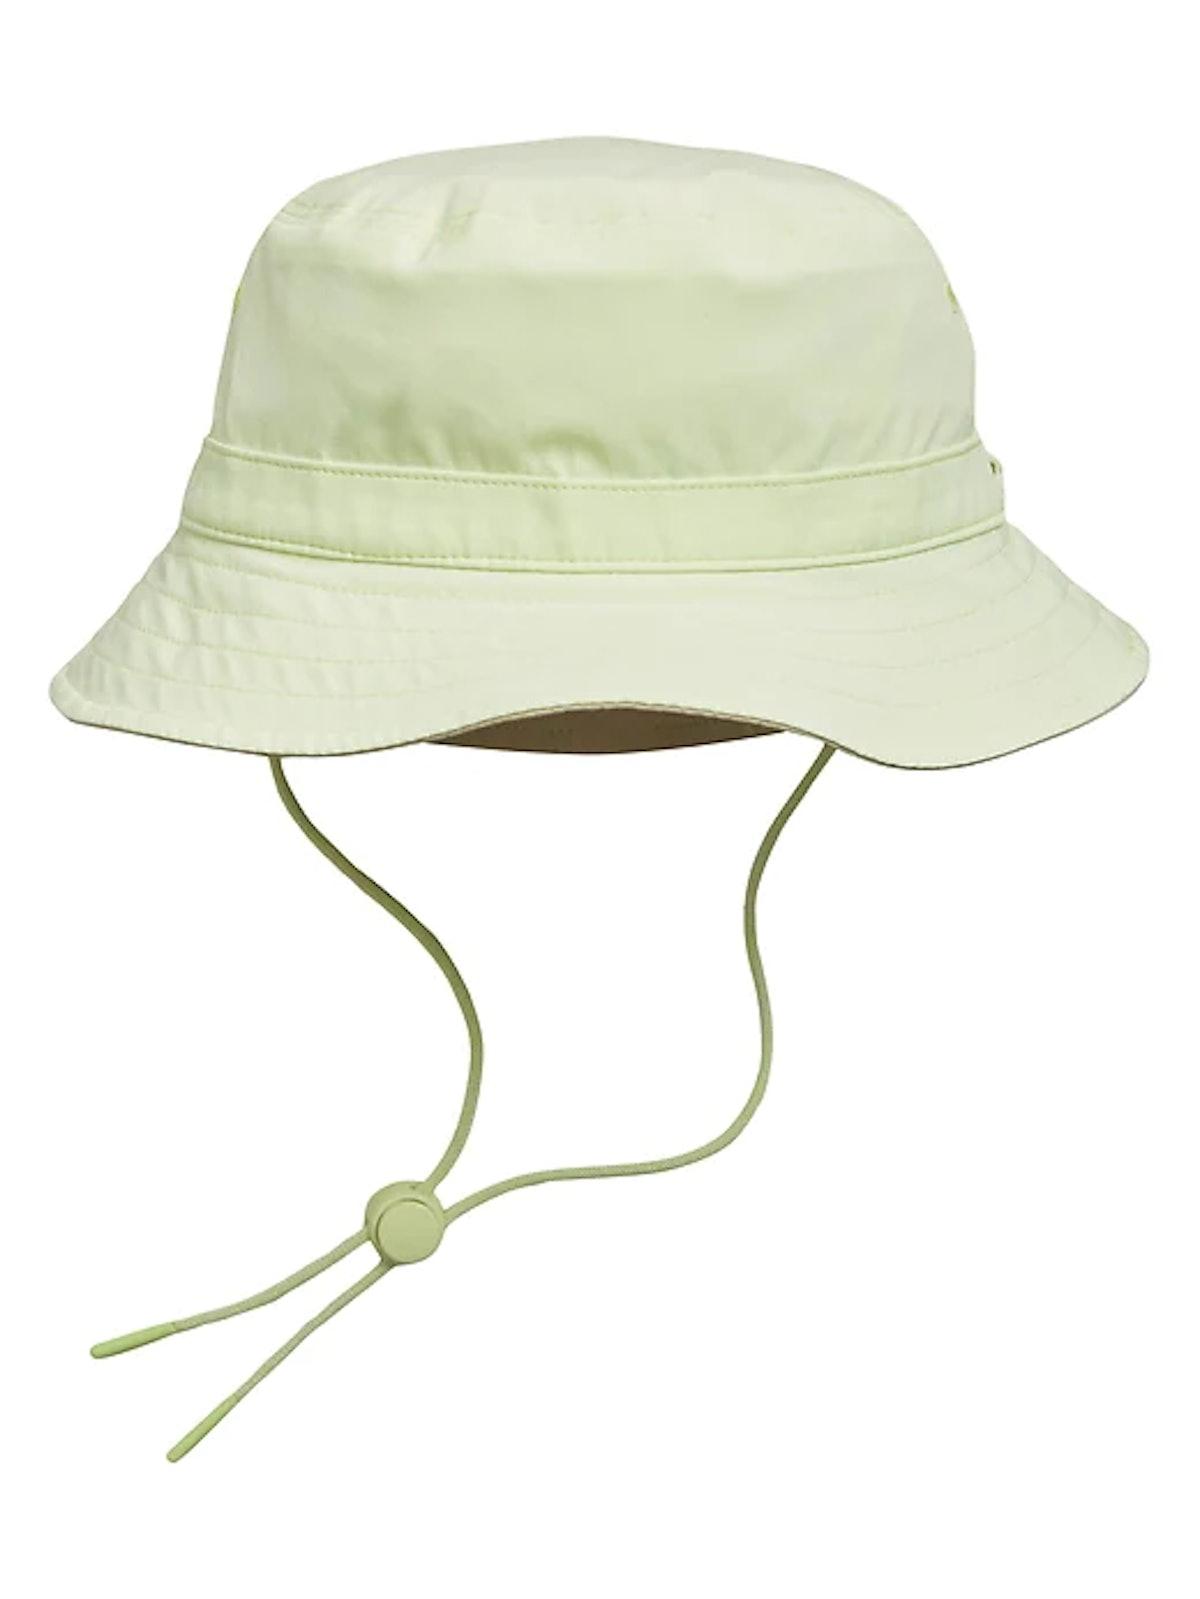 athleta bucket hat